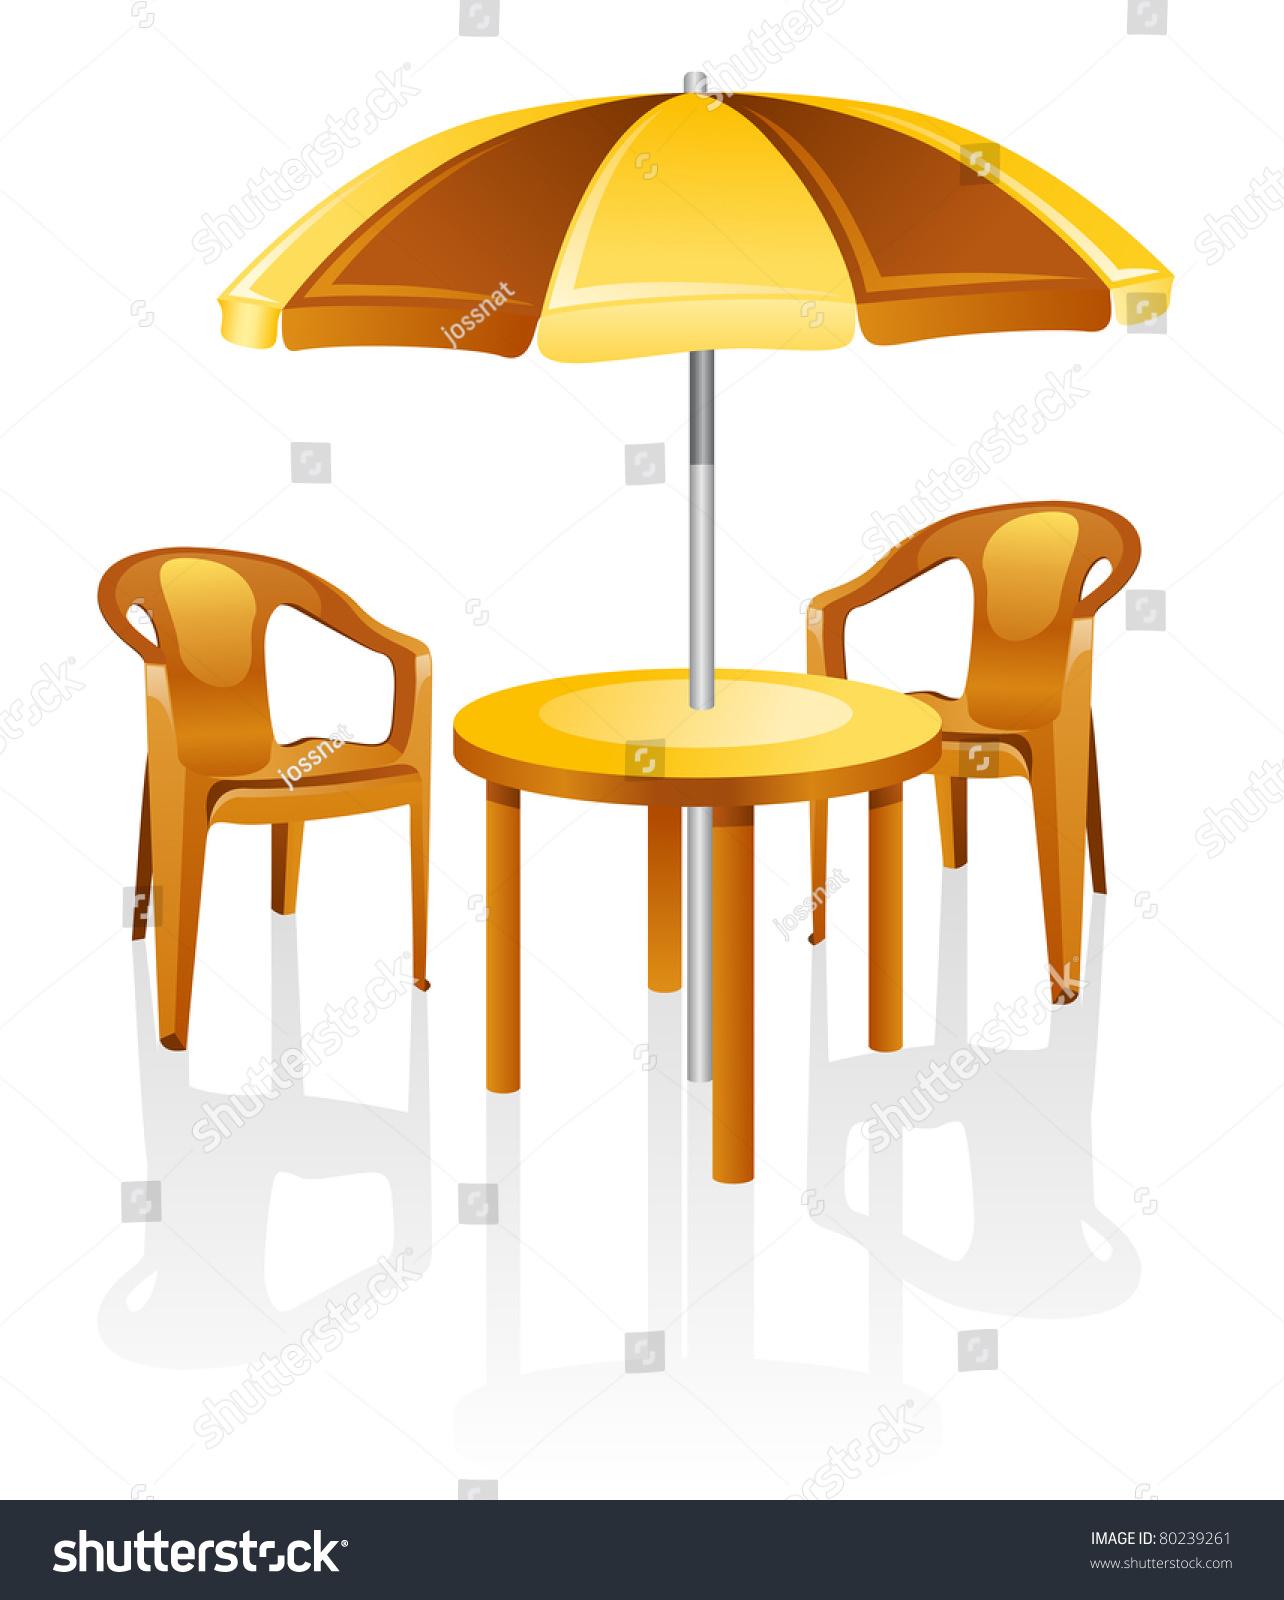 free clip art patio furniture - photo #9